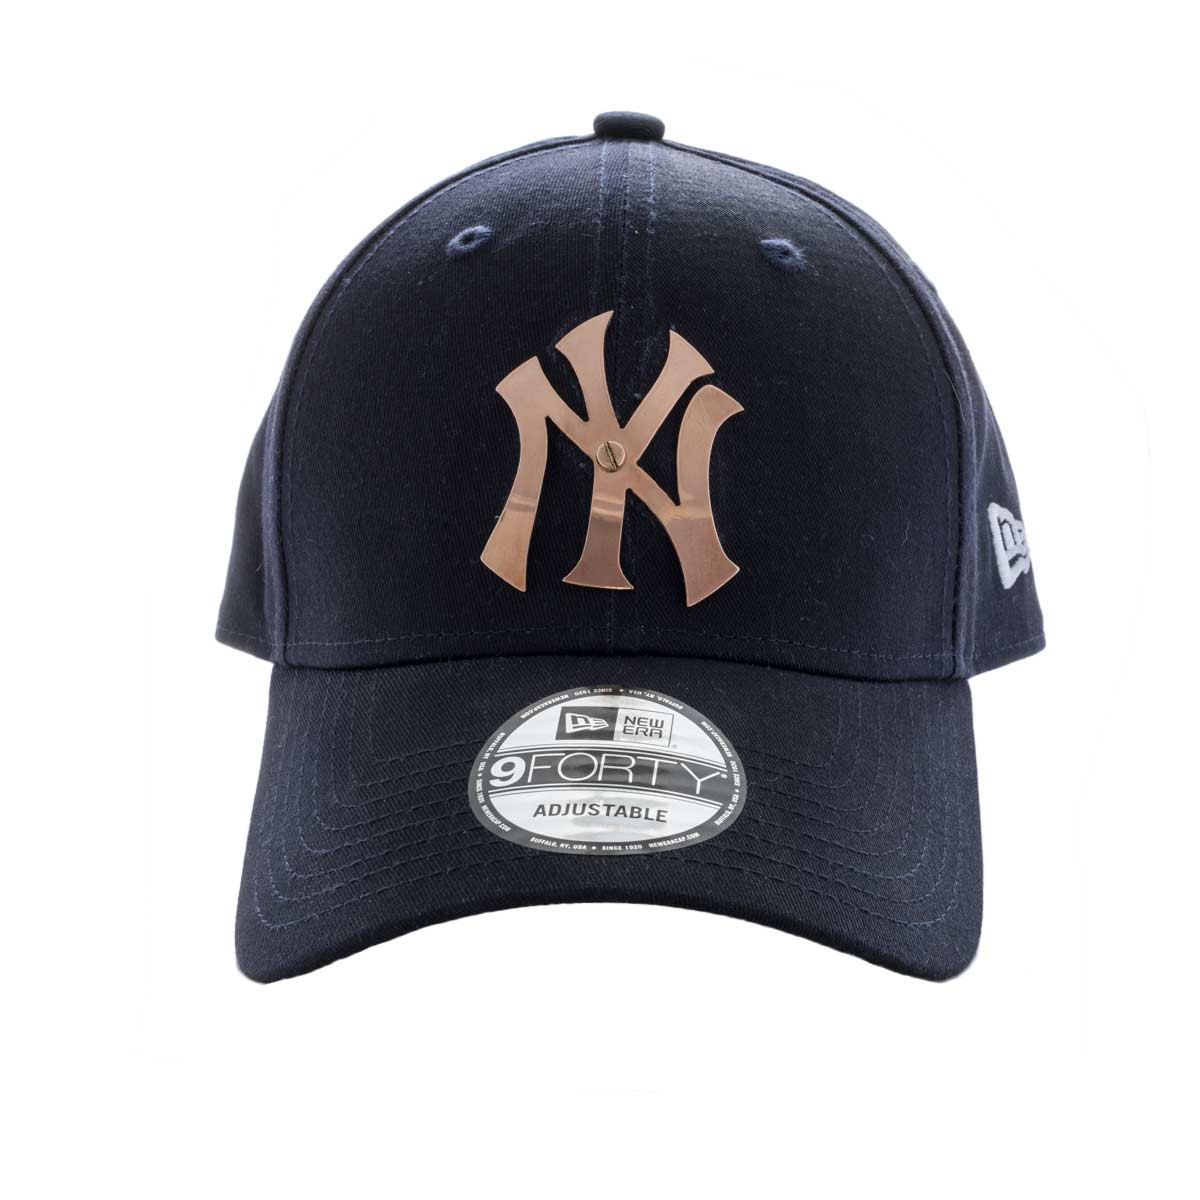 Elite Luxury New York Yankees Cap-Navy-Rose Gold